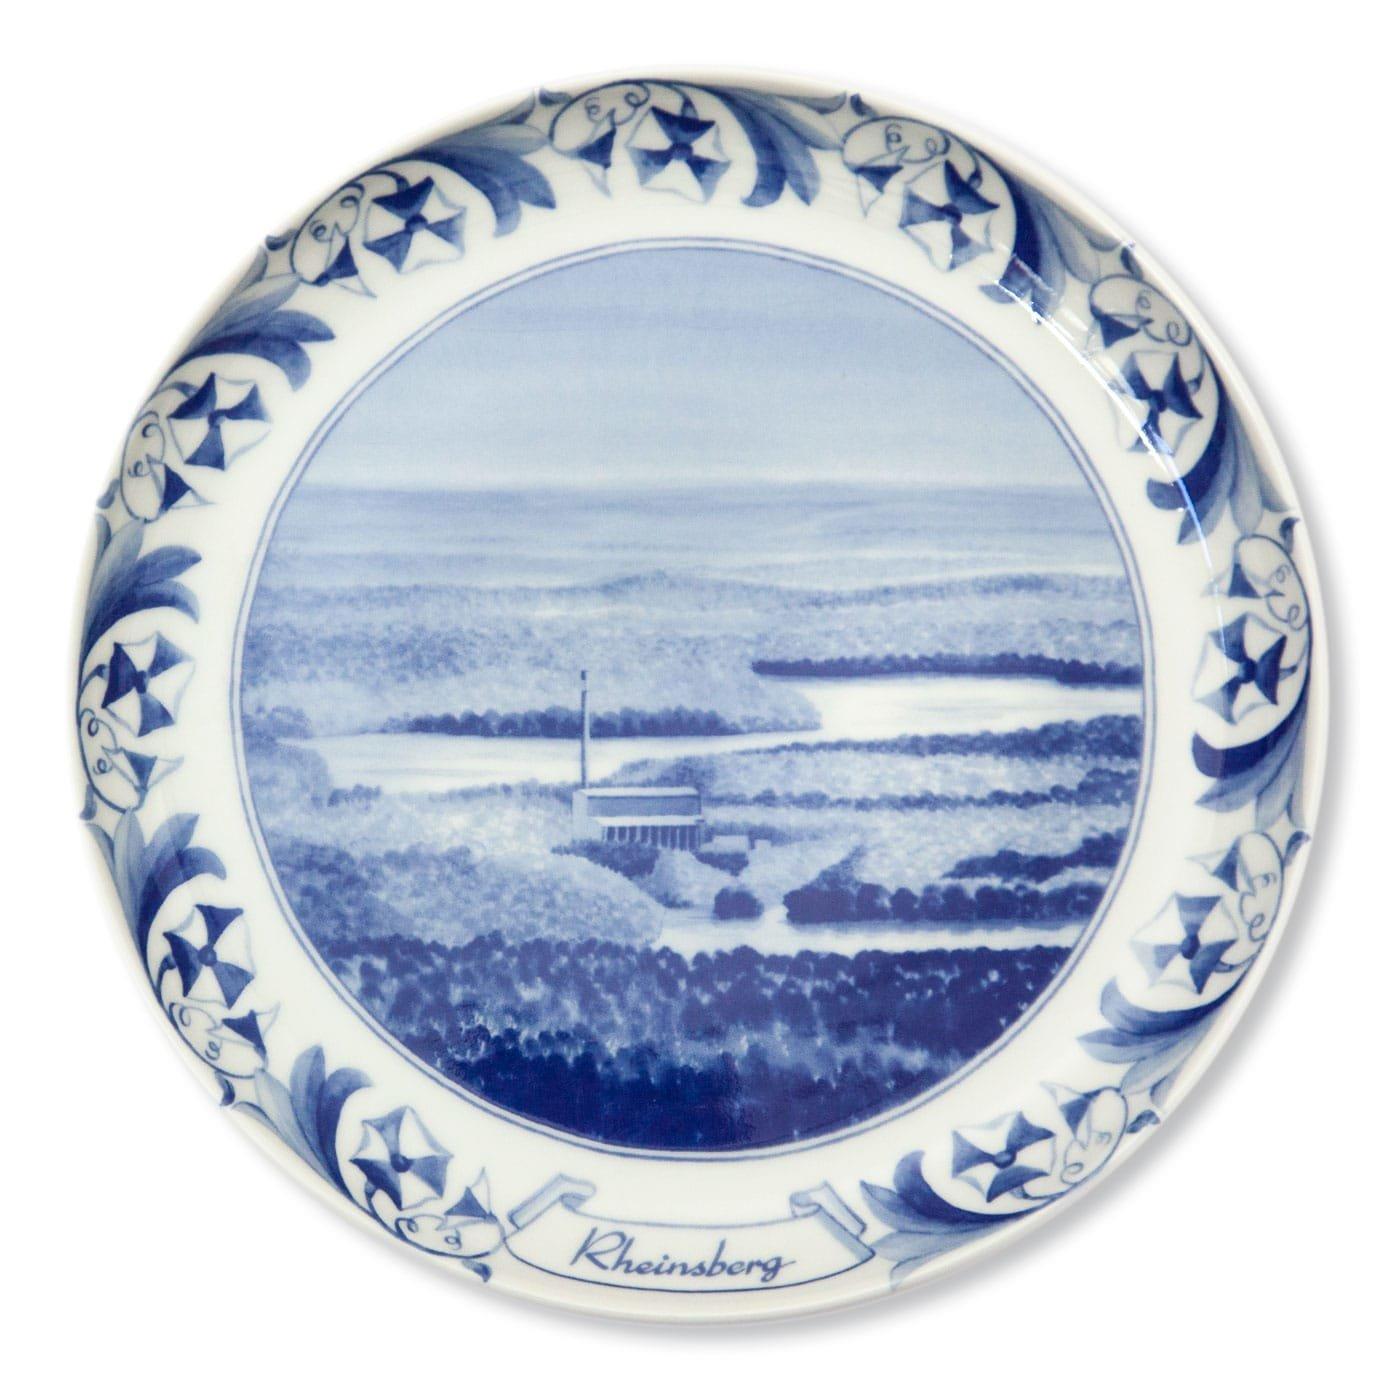 porcelain-nuclear-reactors-plates-rheinsberg